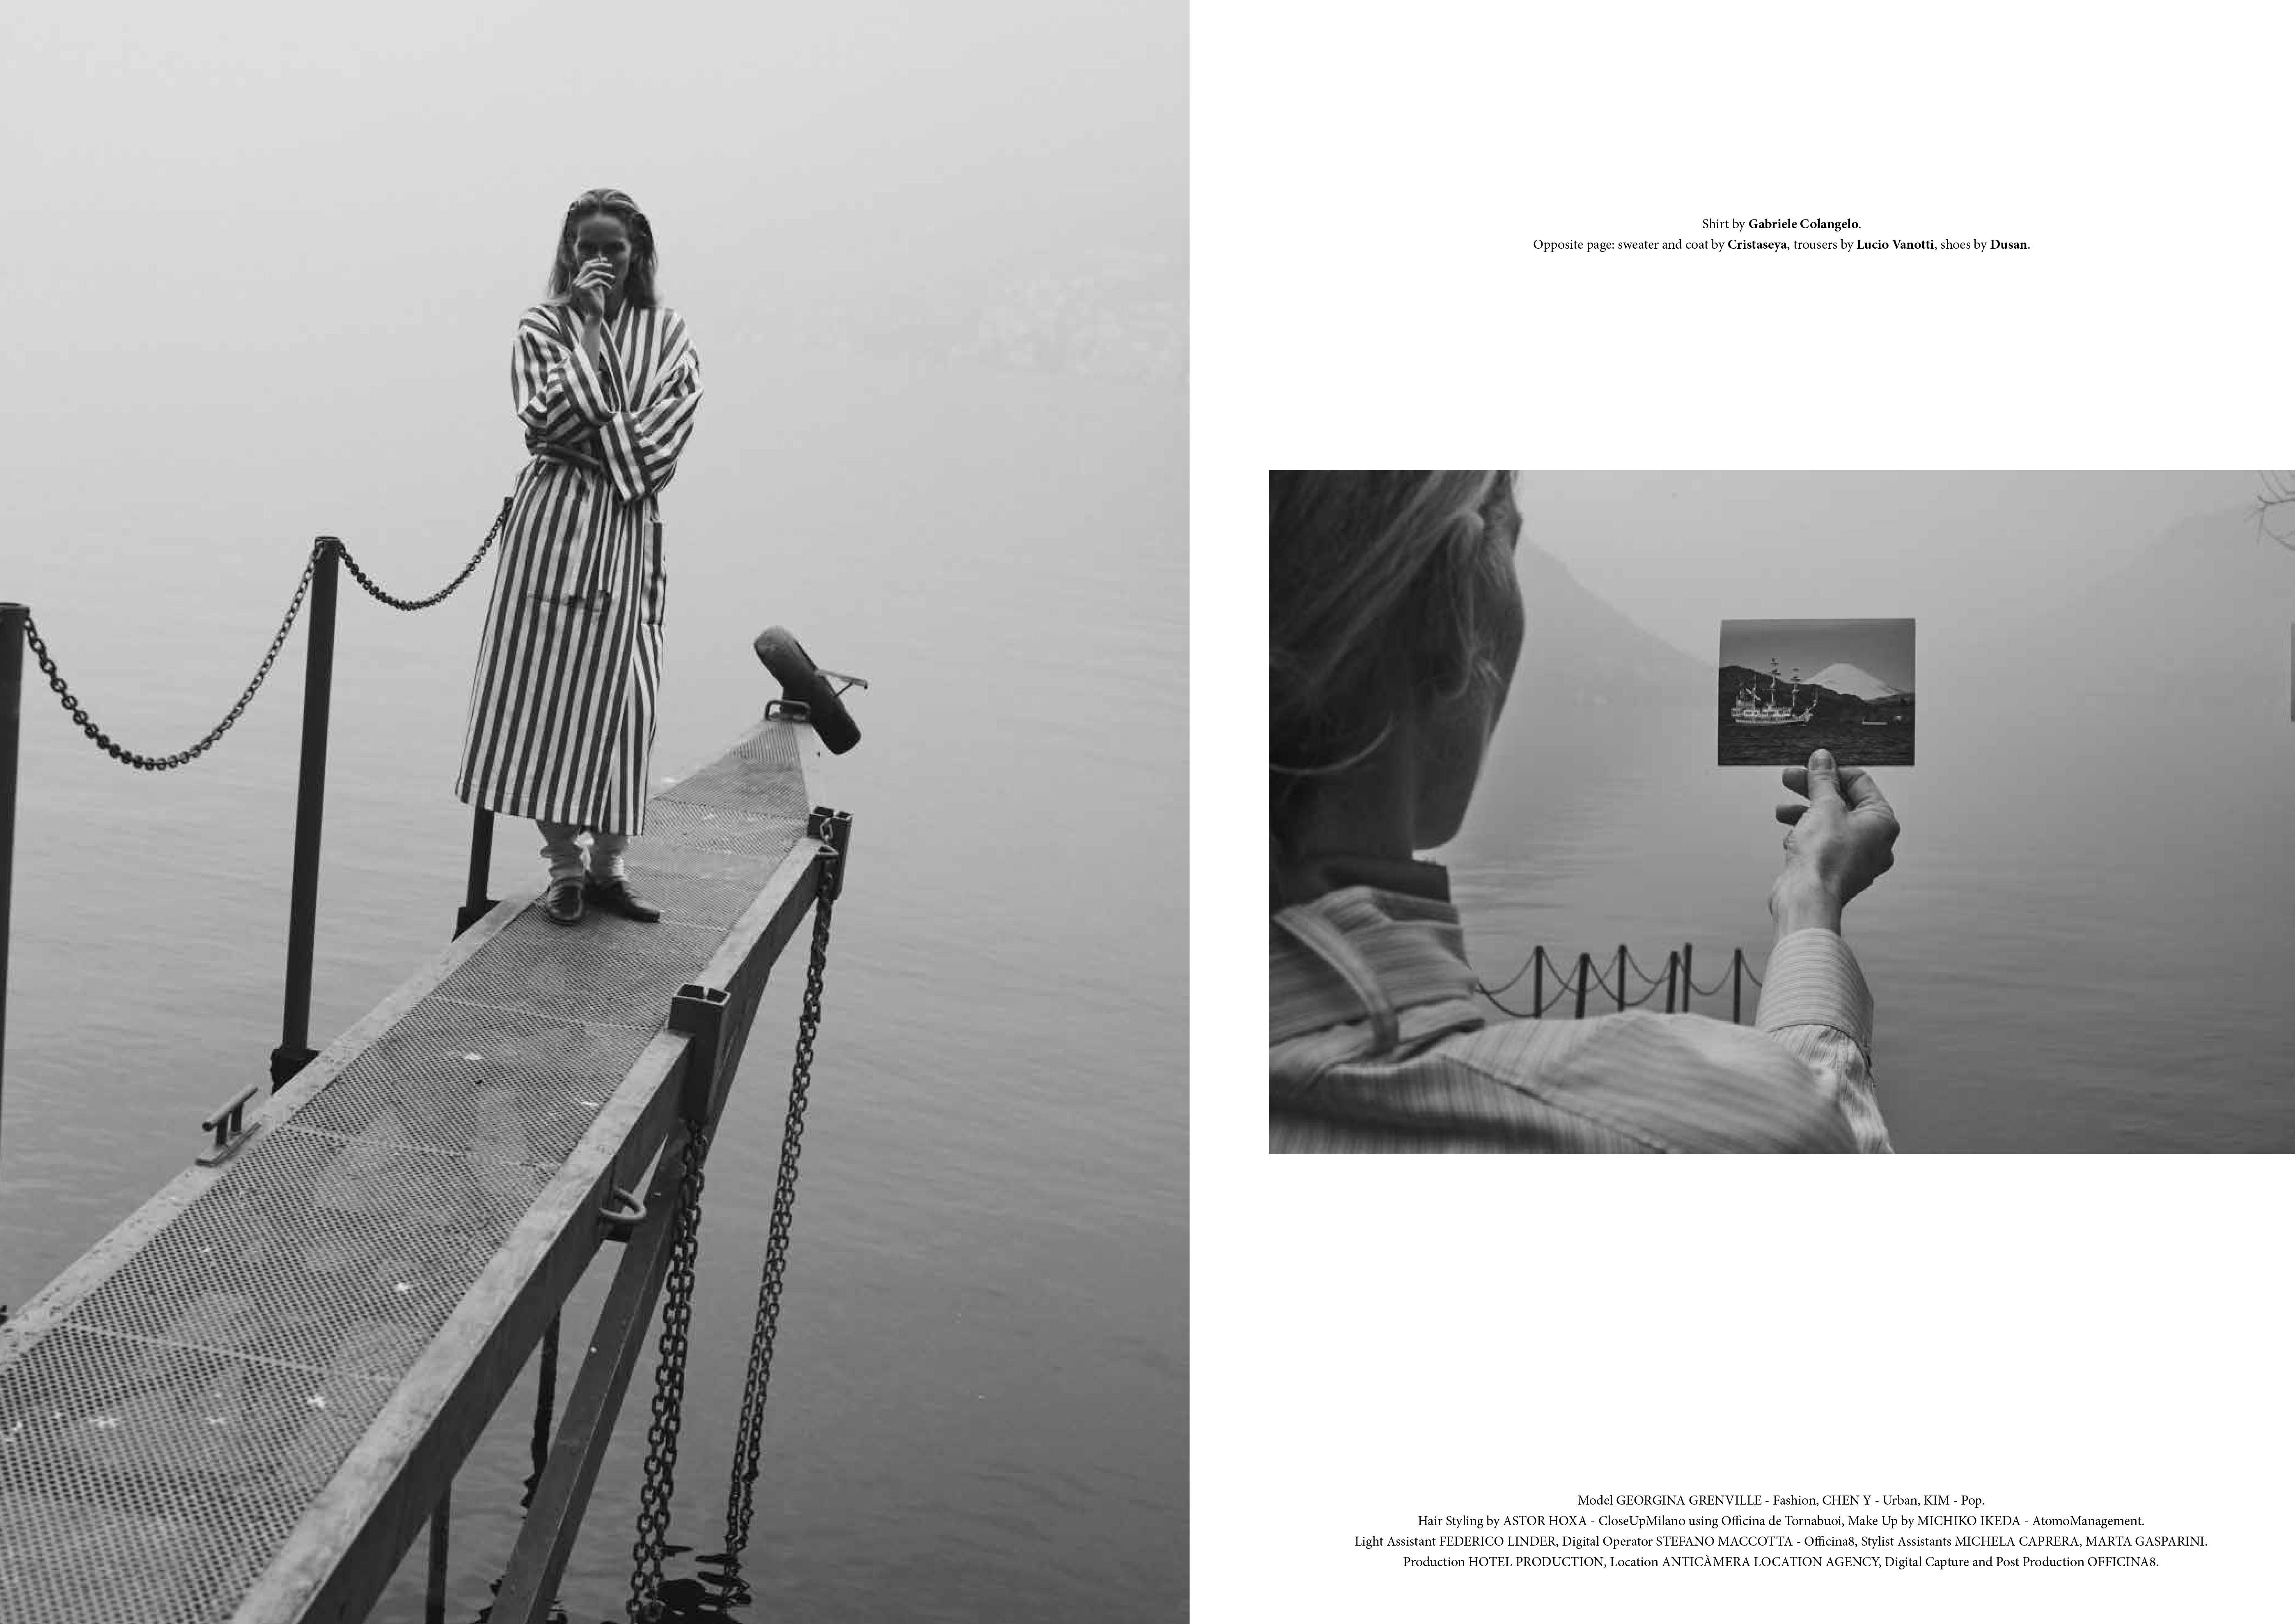 Tanya Jones for Cartography (ph. Stefano Galuzzi)